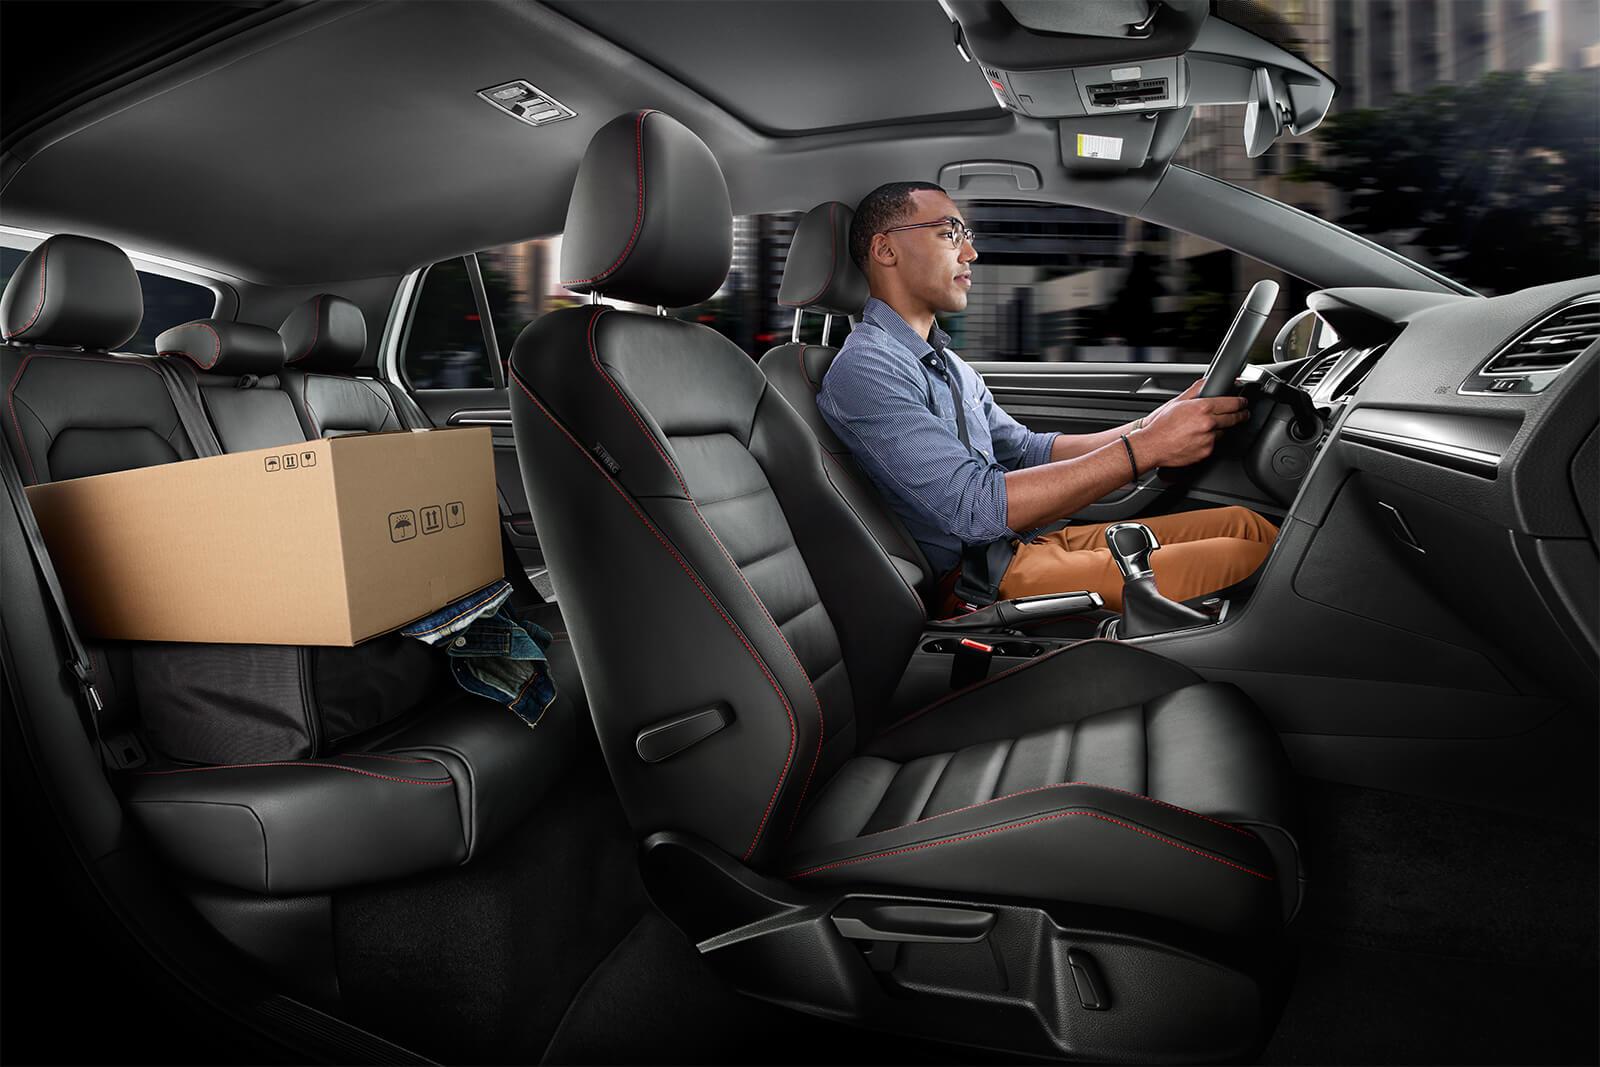 2020 Golf GTI Interior